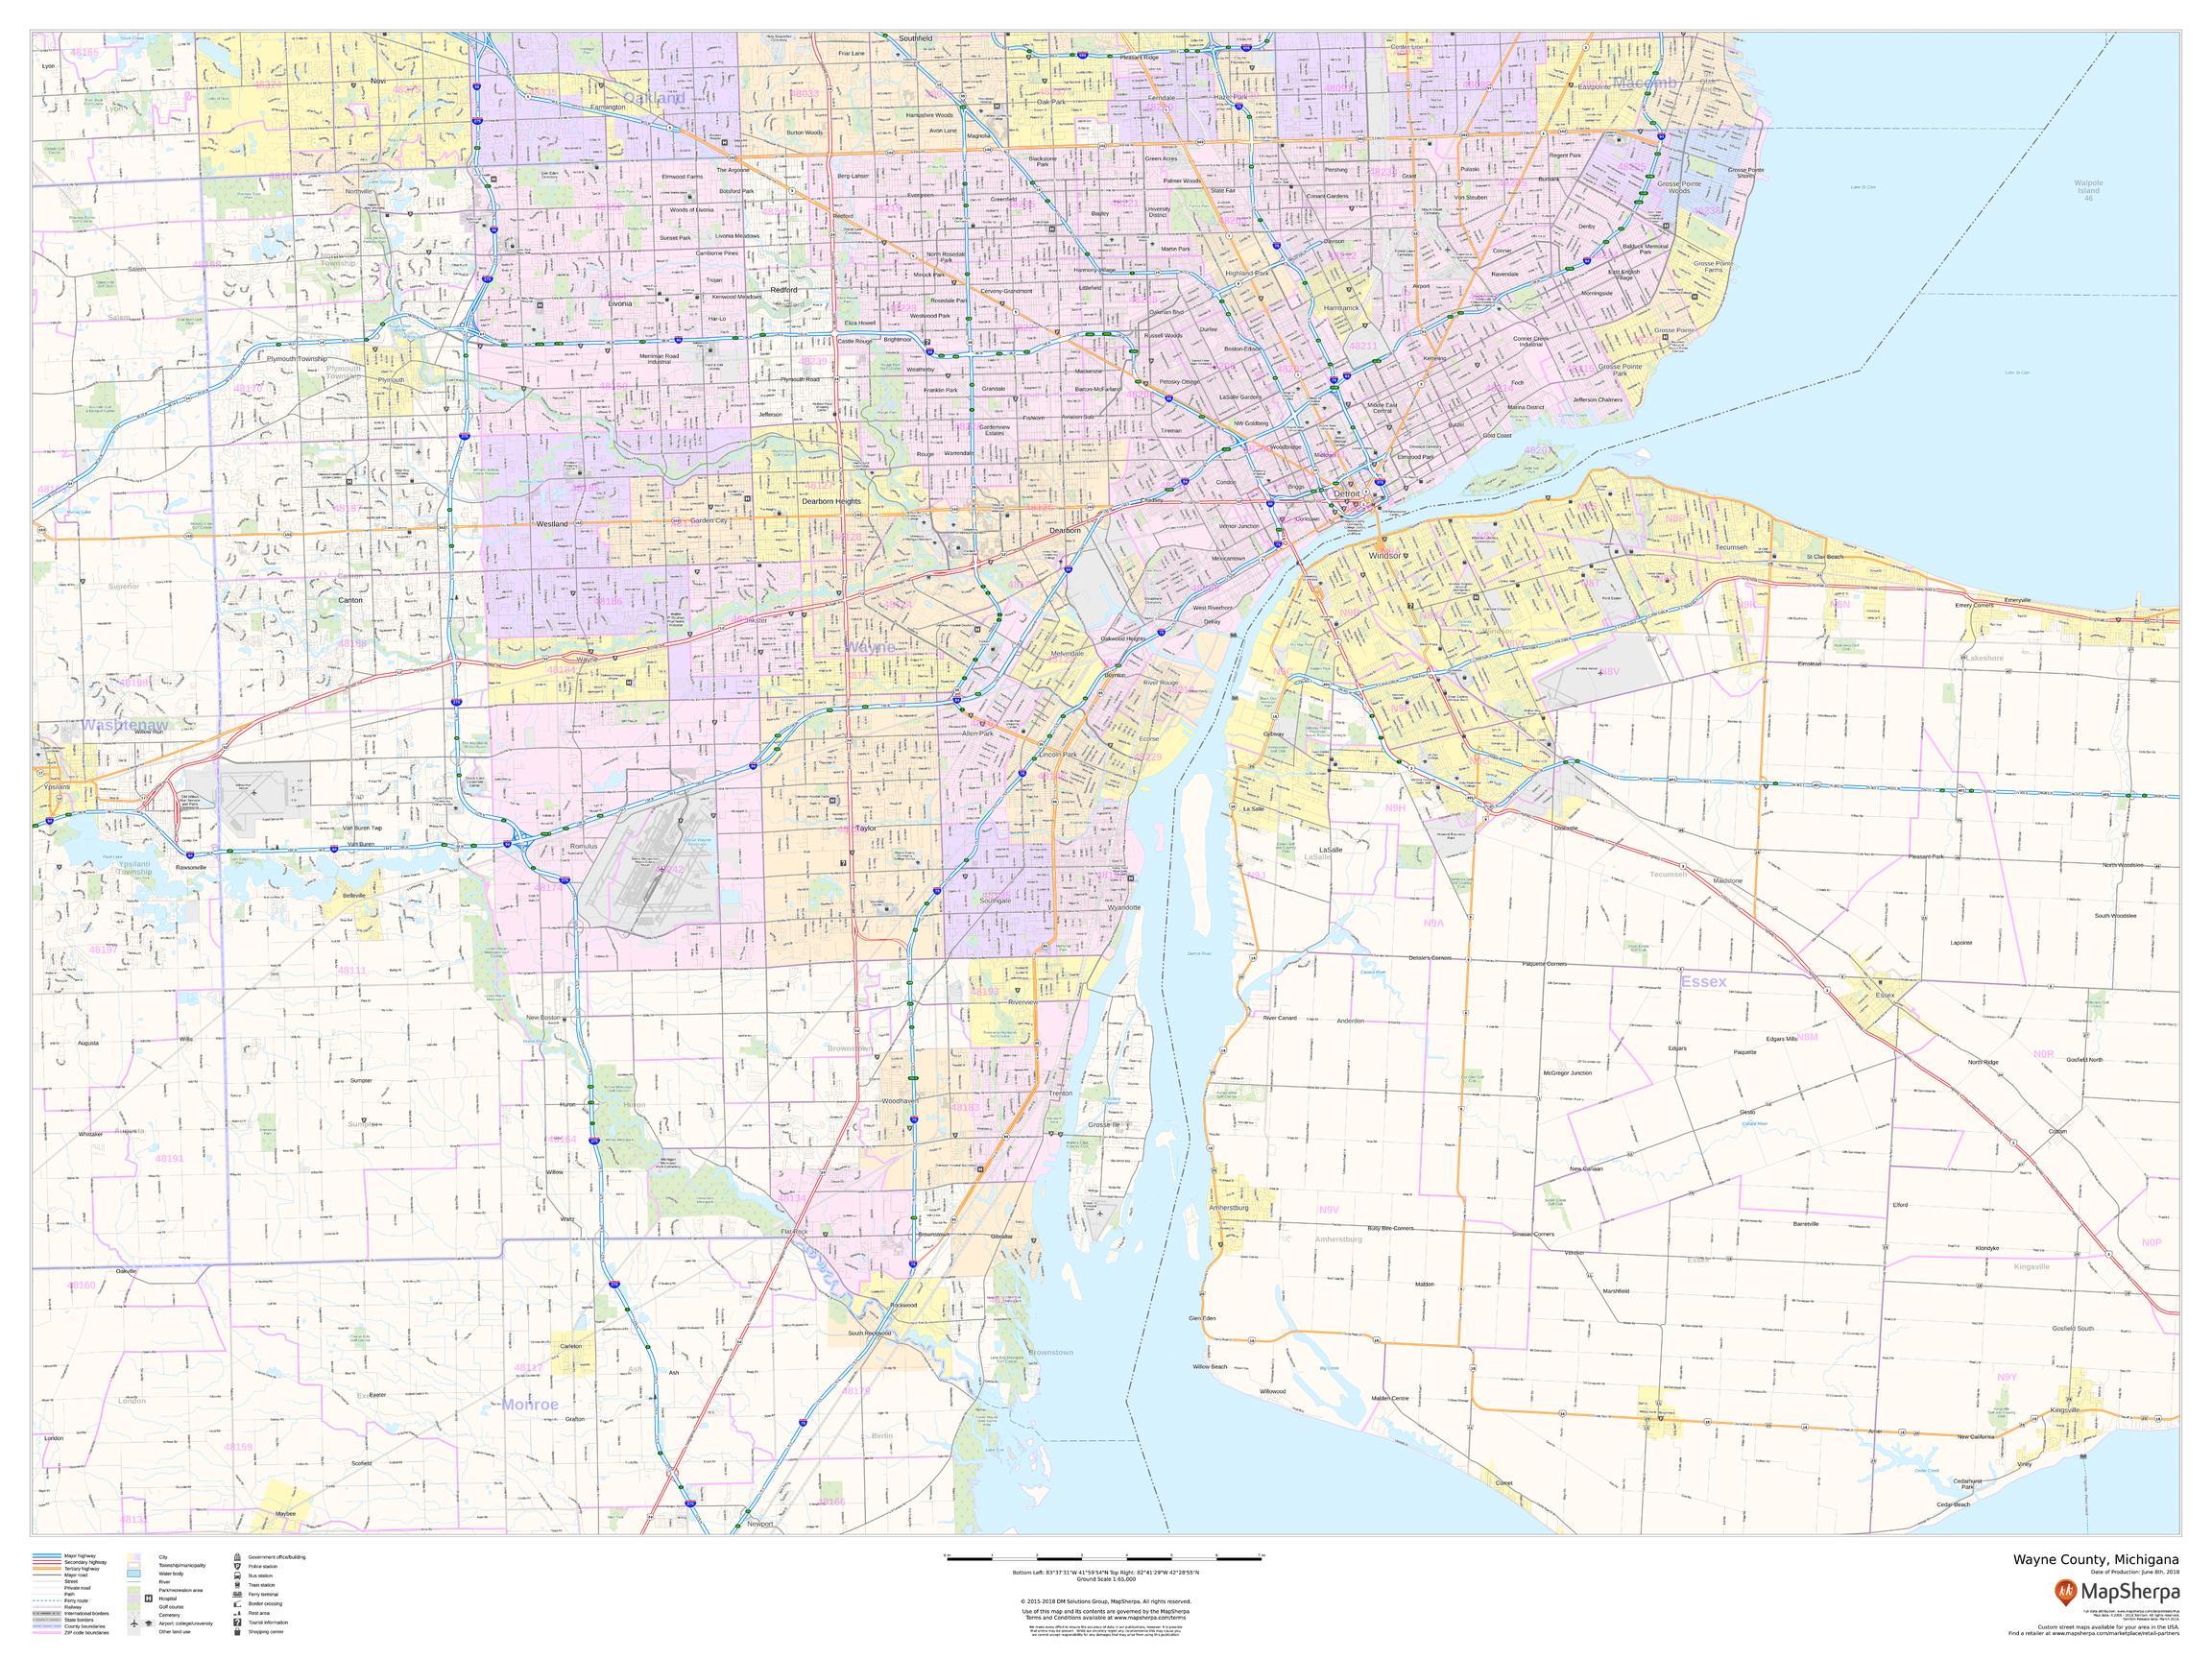 Wayne County Zip Code Map, Michigan